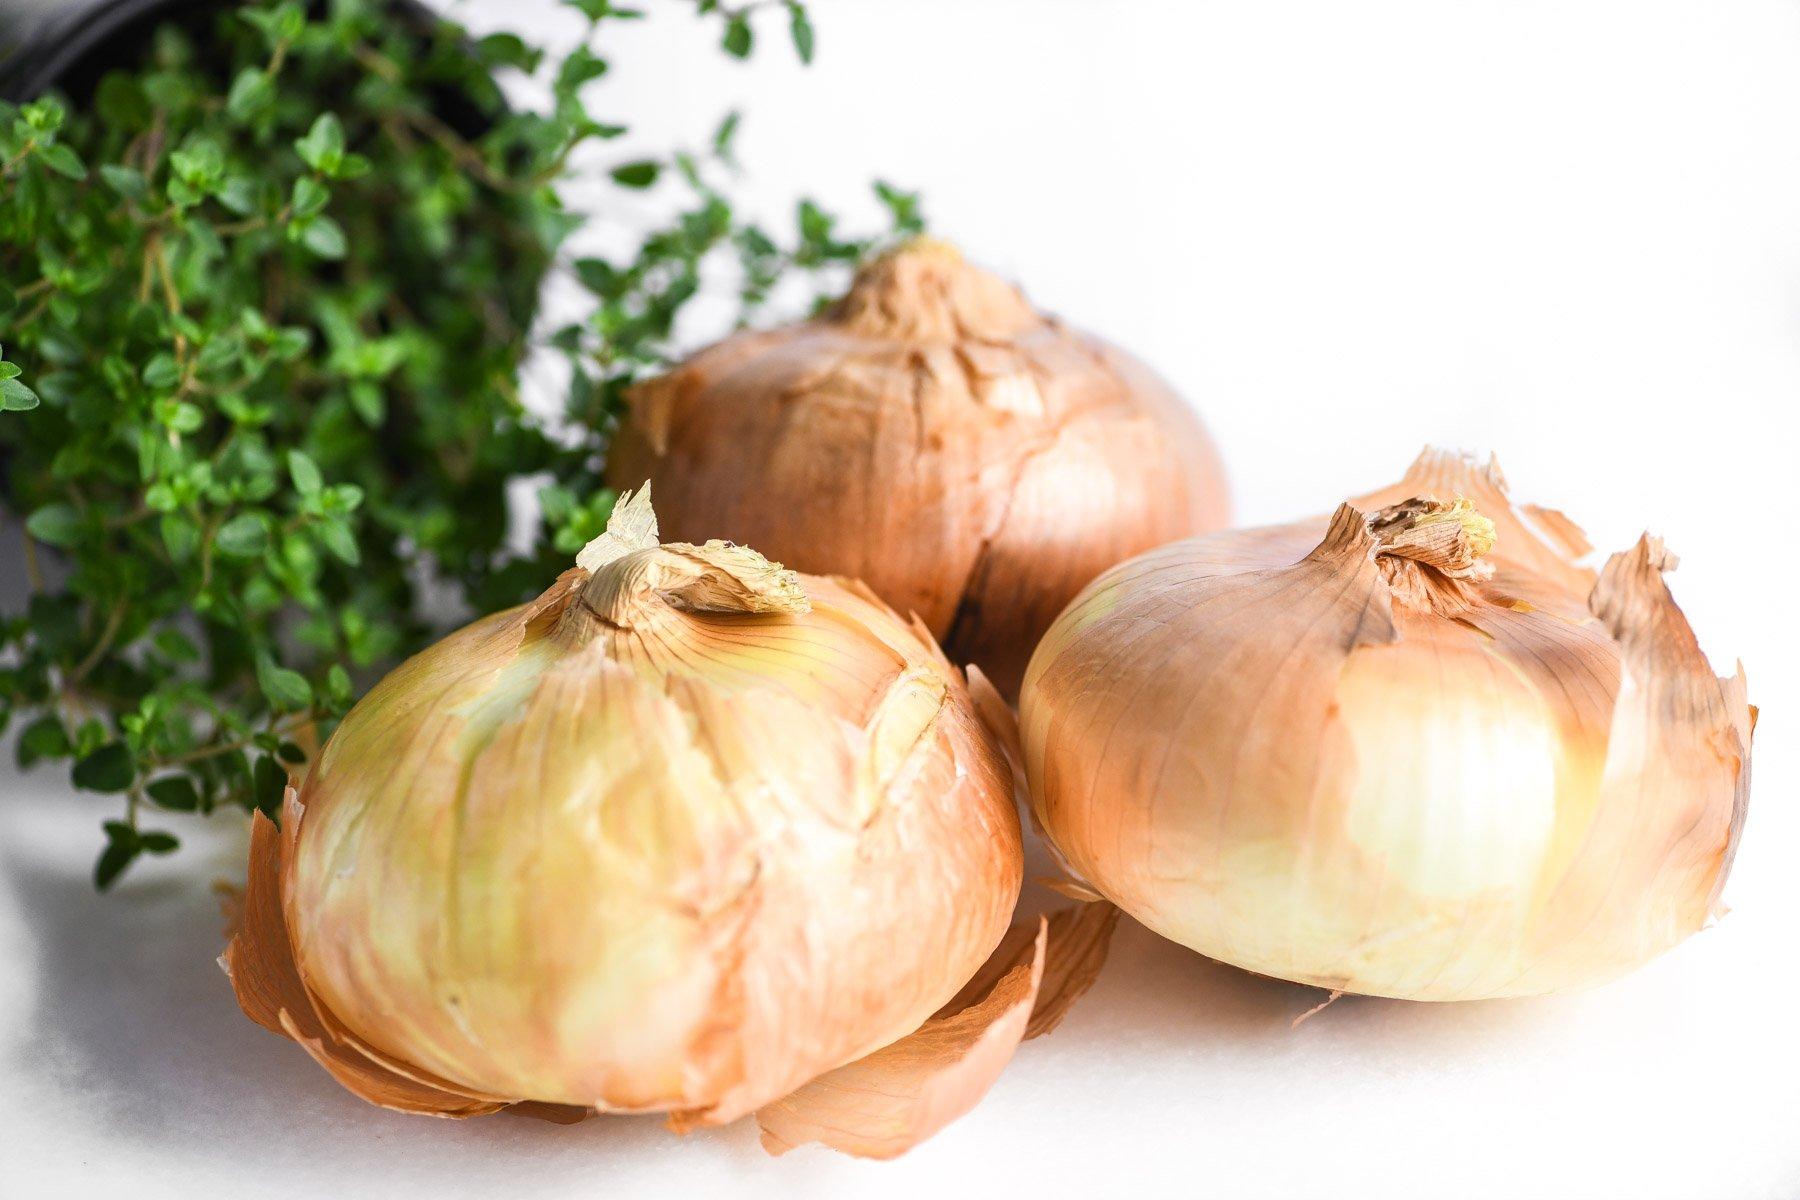 sweet Vidalia onions and thyme